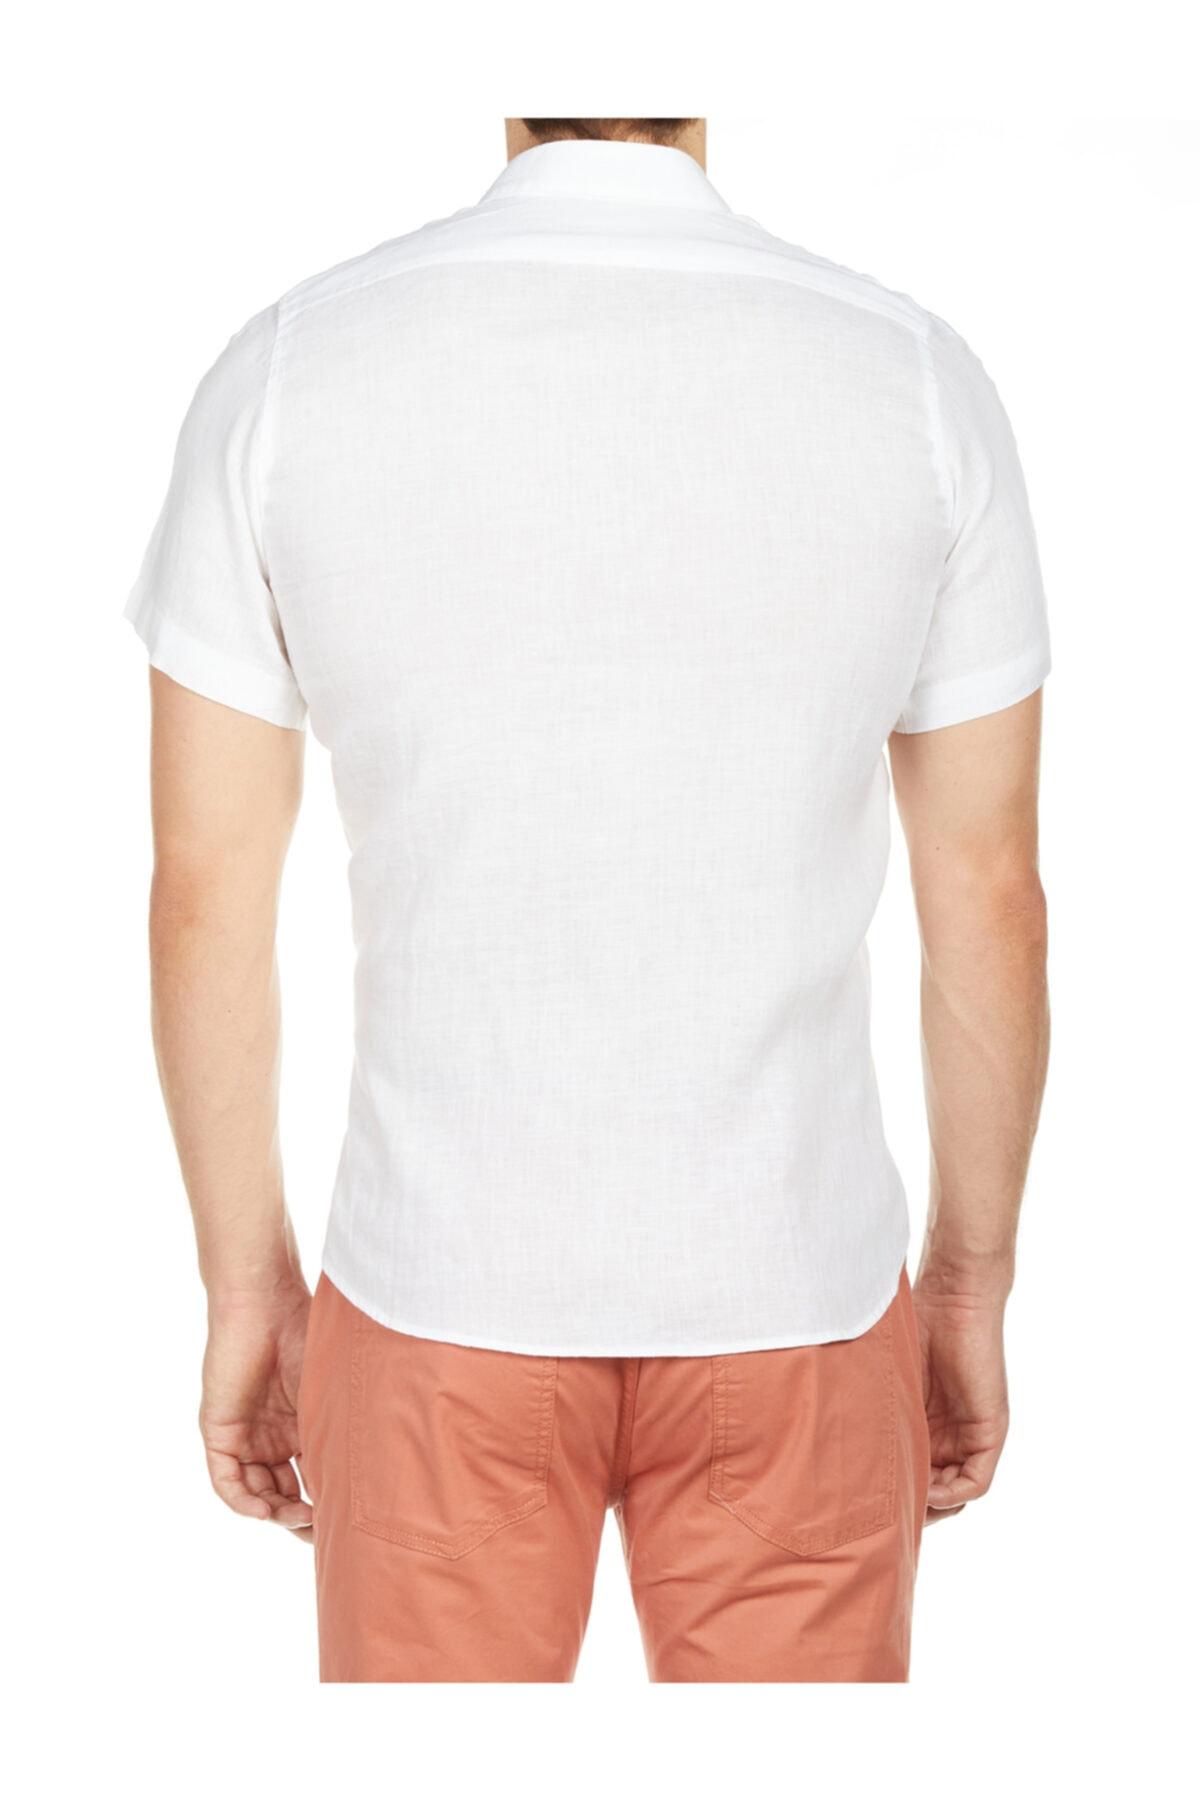 Bisse Regular Fit Kısa Kollu Keten Gömlek 2